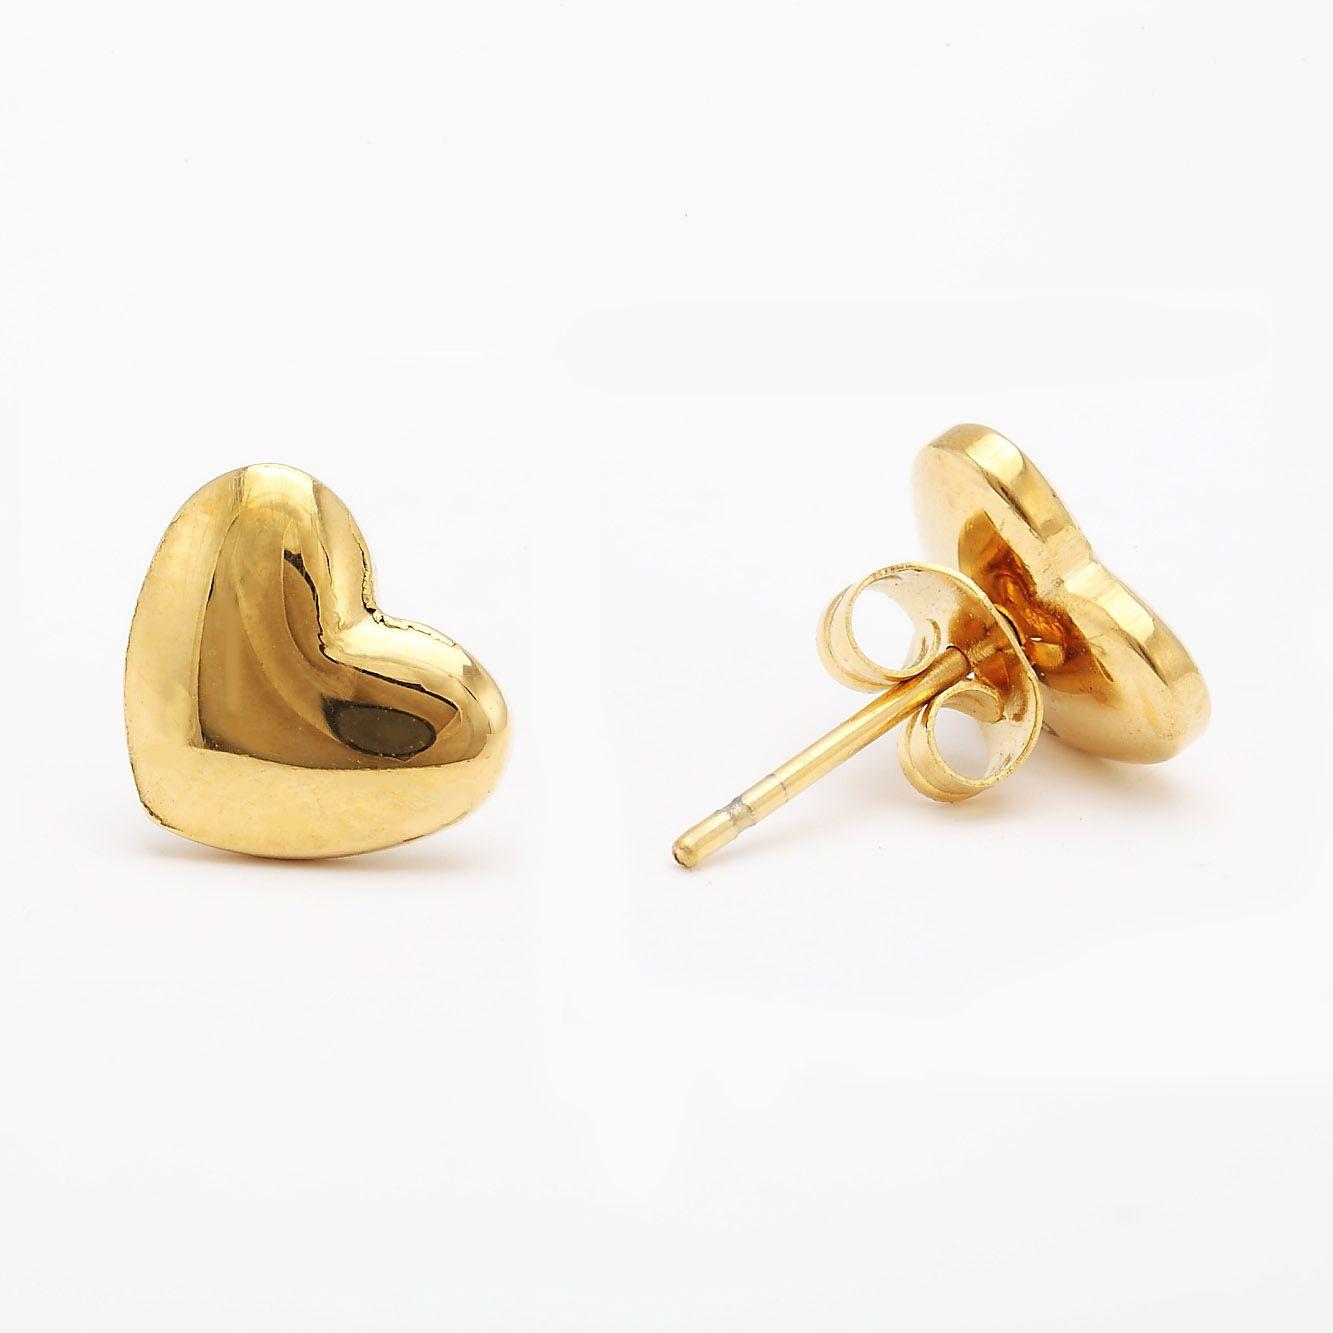 Corazón Aretes Oro Dorado para Mujer | aretes | Pinterest